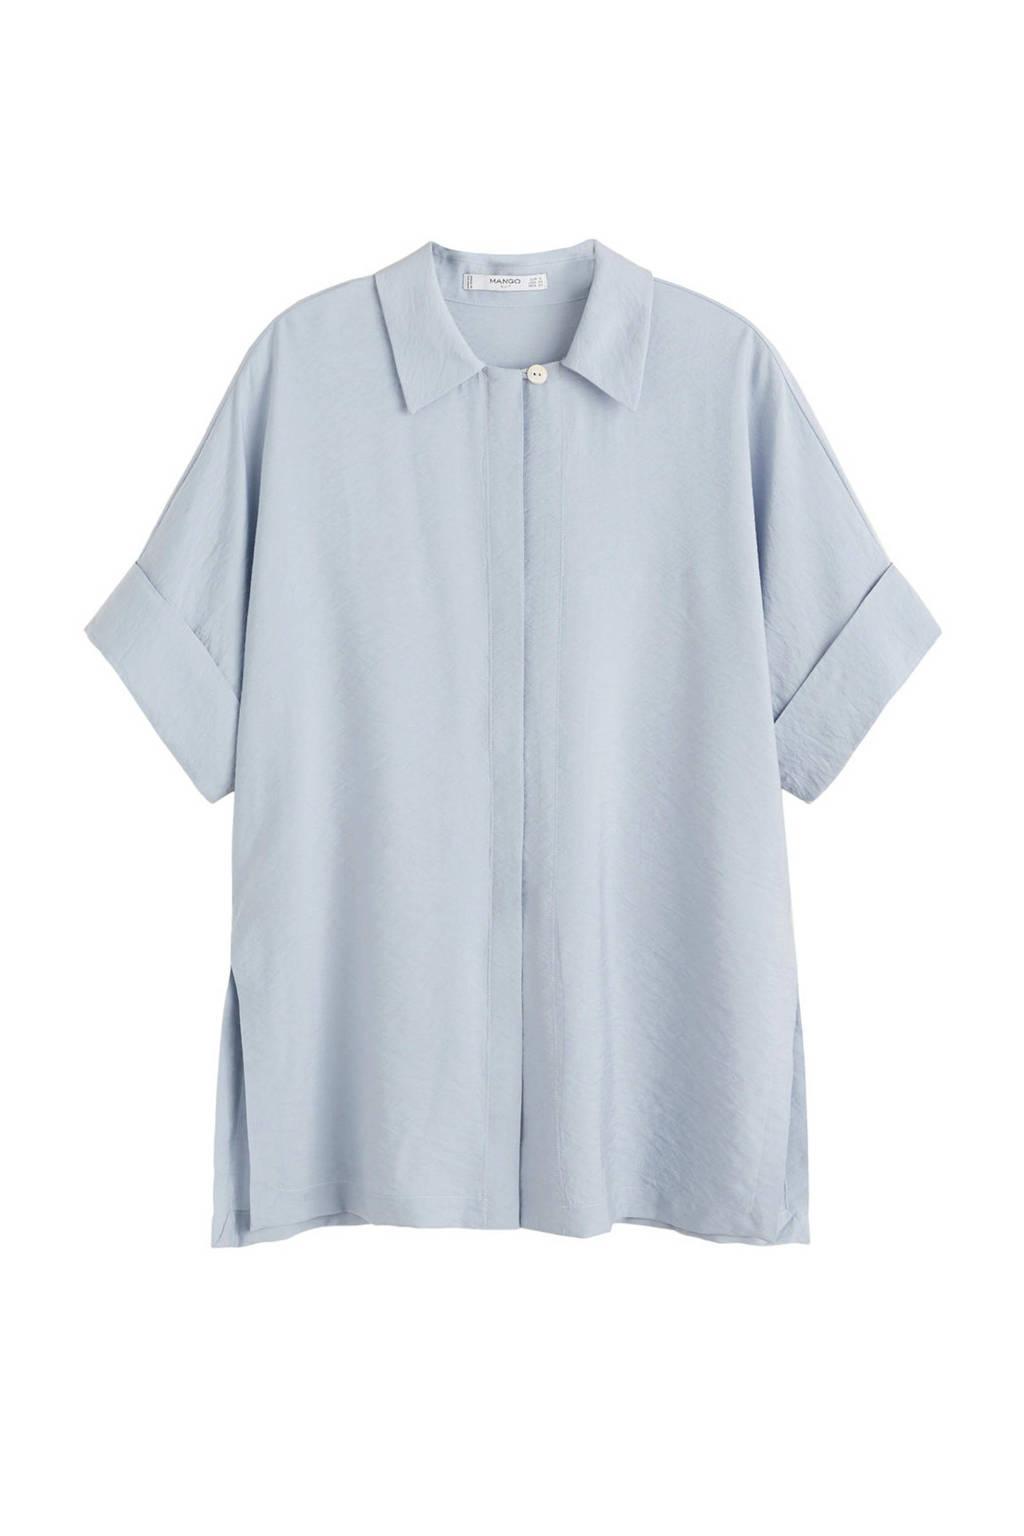 Mango blouse, pastelblauw